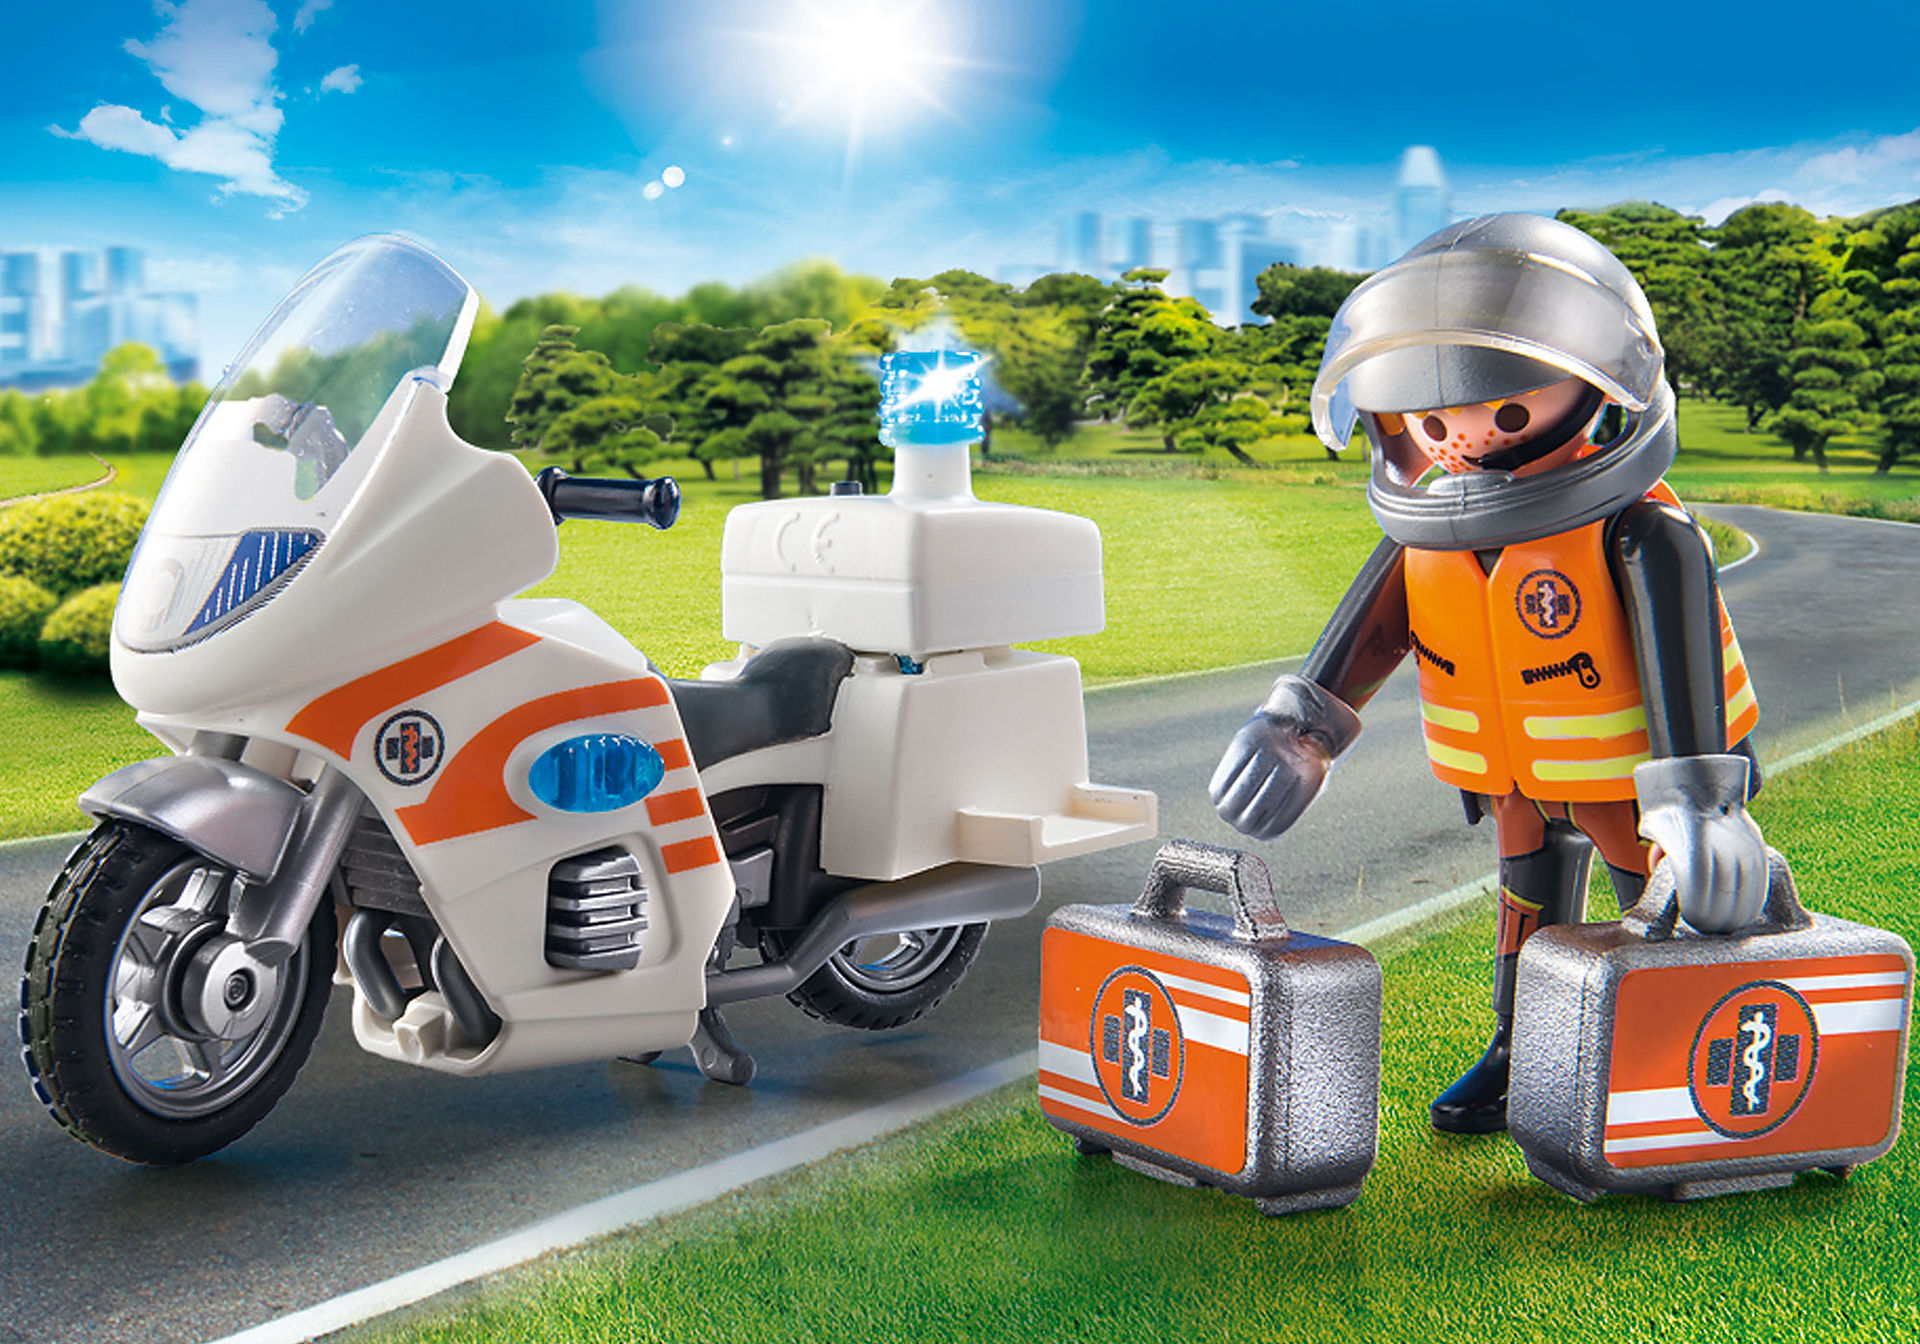 70051 Emergency Motorbike zoom image4